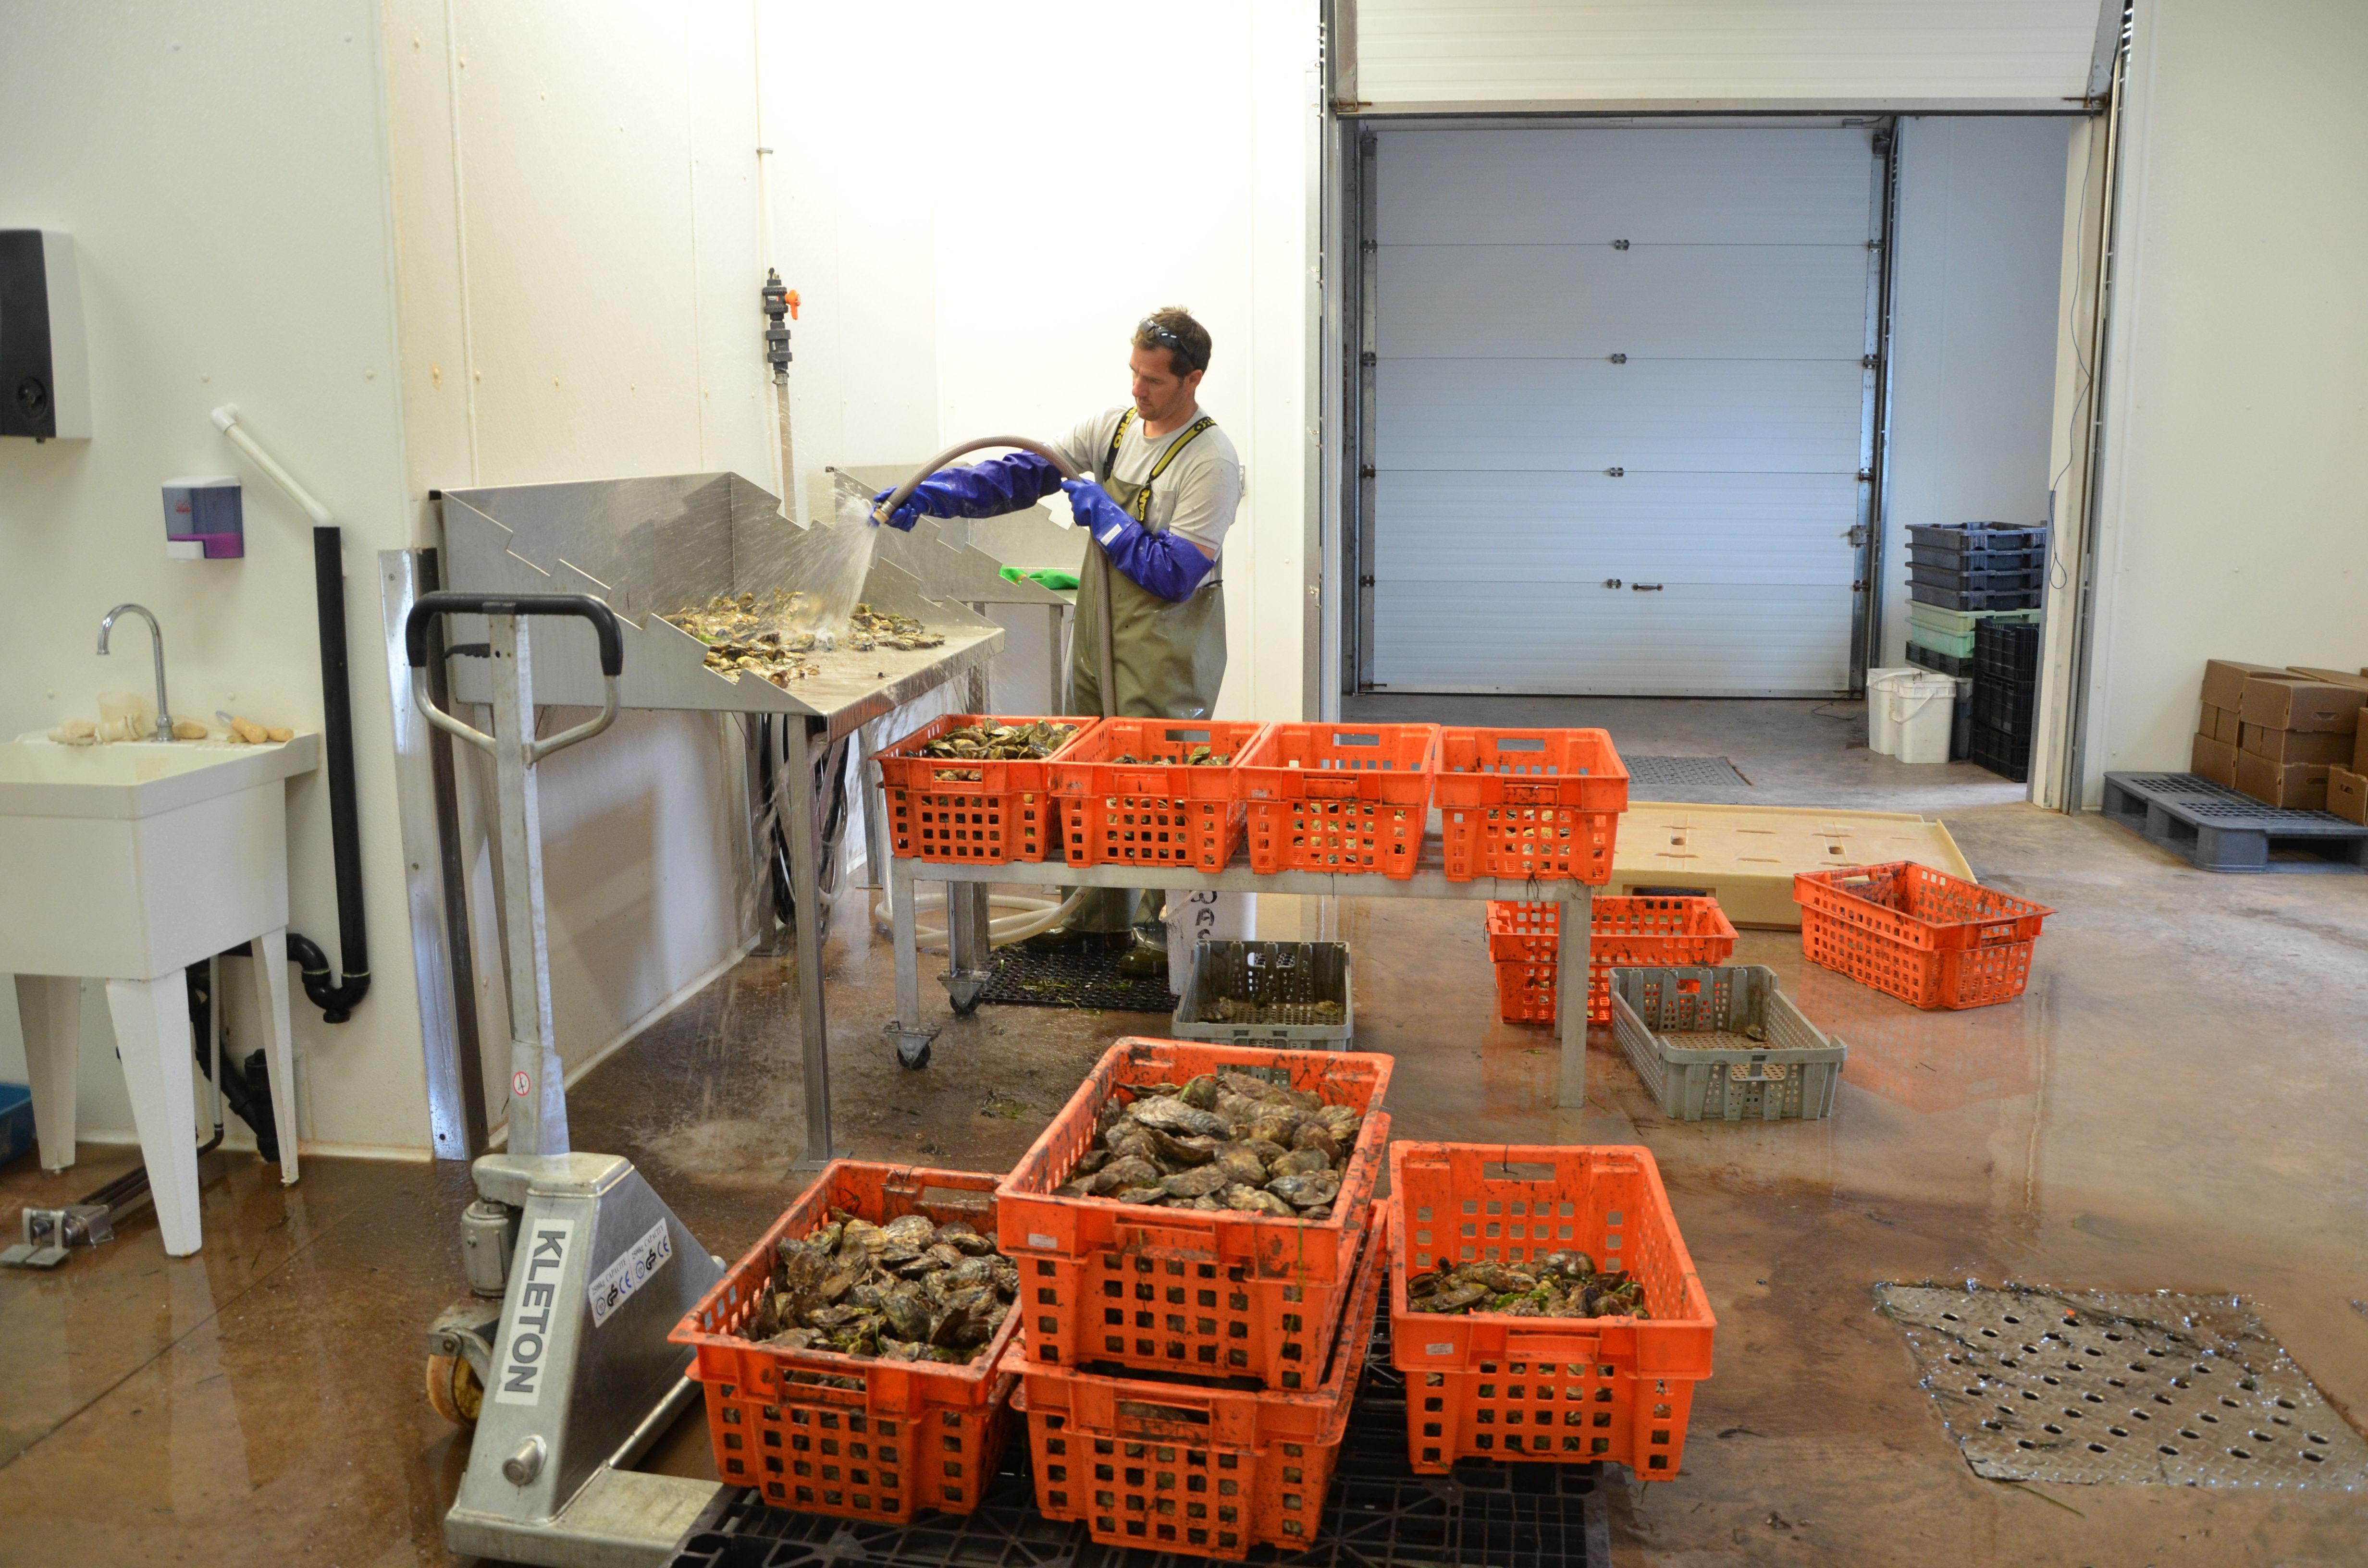 CleaningOysters Rodney's Oyster Depot #PEIOysters #RodneysOysterDepot @RodneysToronto